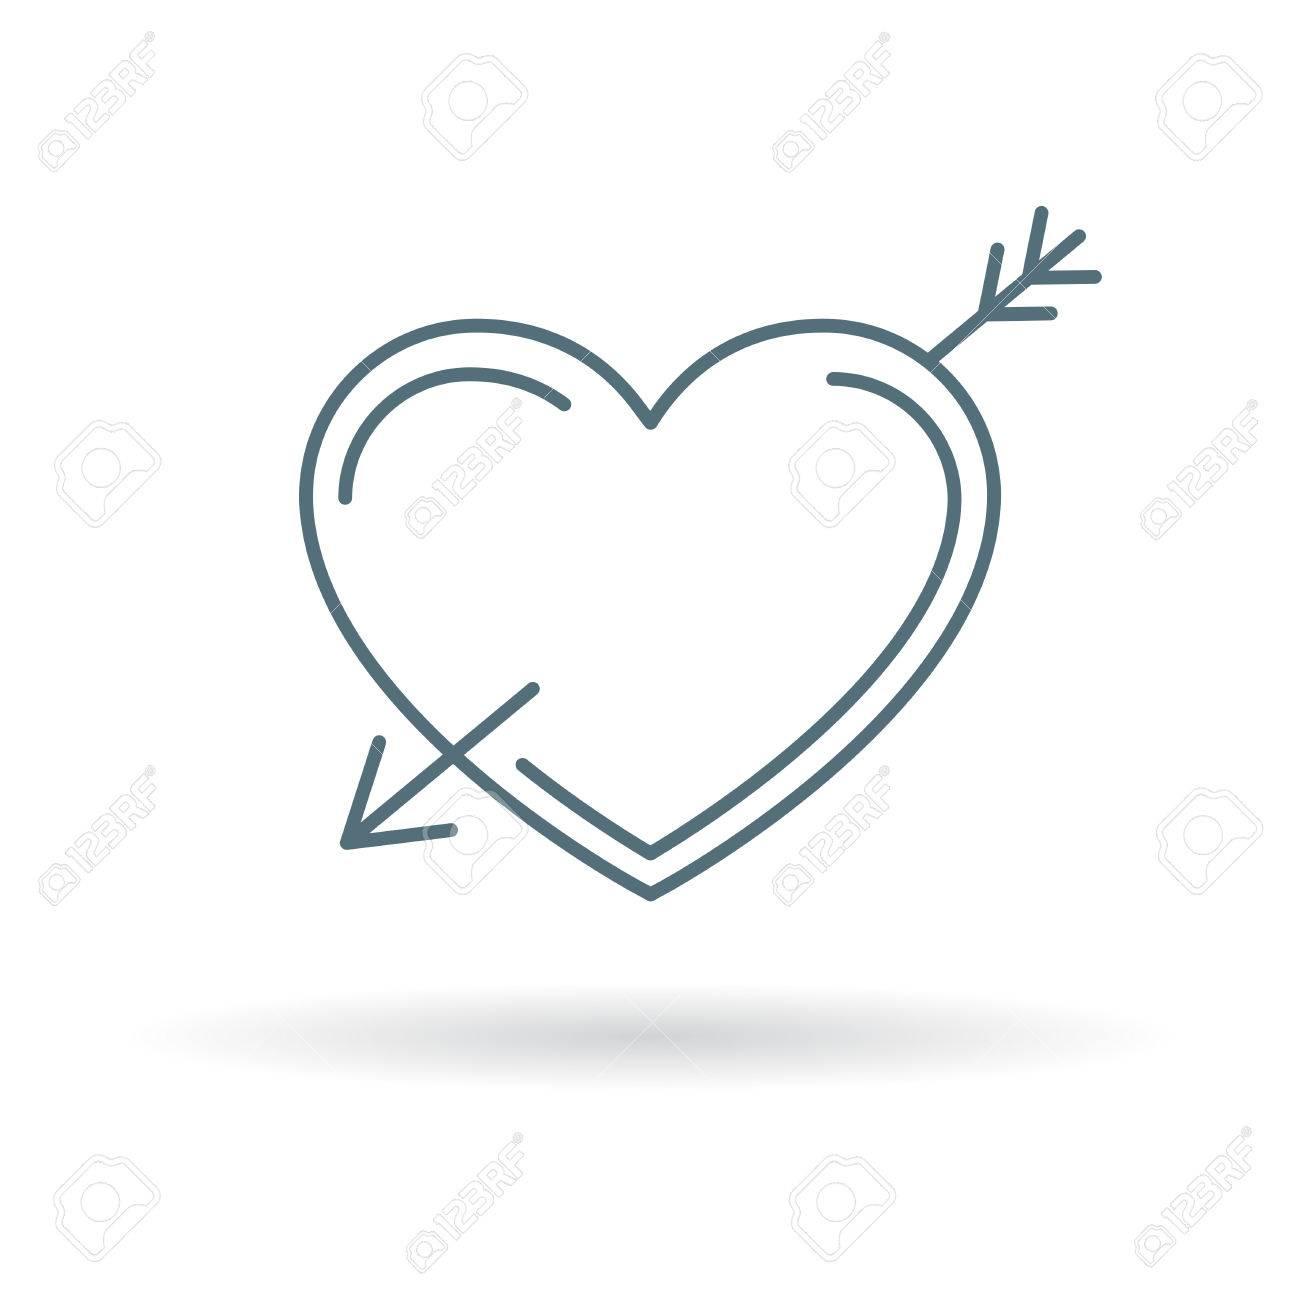 Arrow Heart Icon Arrow Heart Sign Arrow Heart Symbol Thin